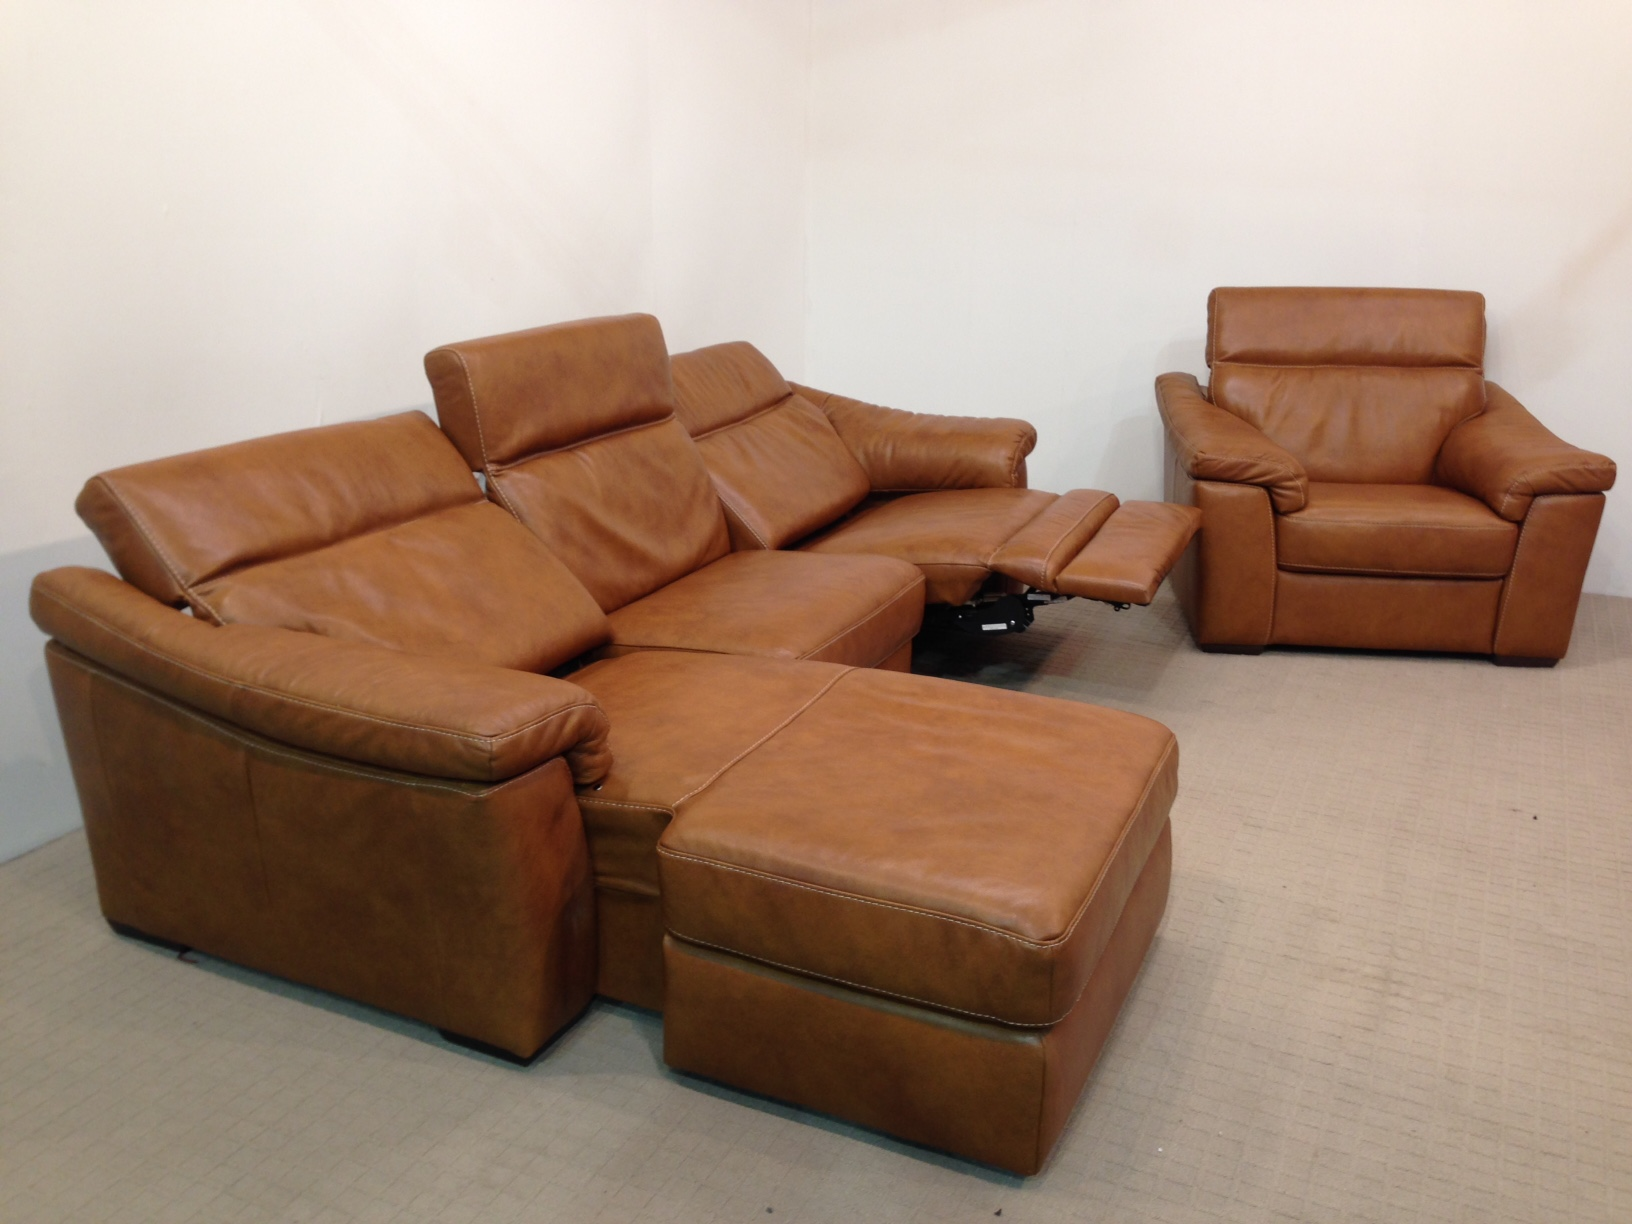 natuzzi electric recliner sofa seat cushions editions sensor b760 chaise and static